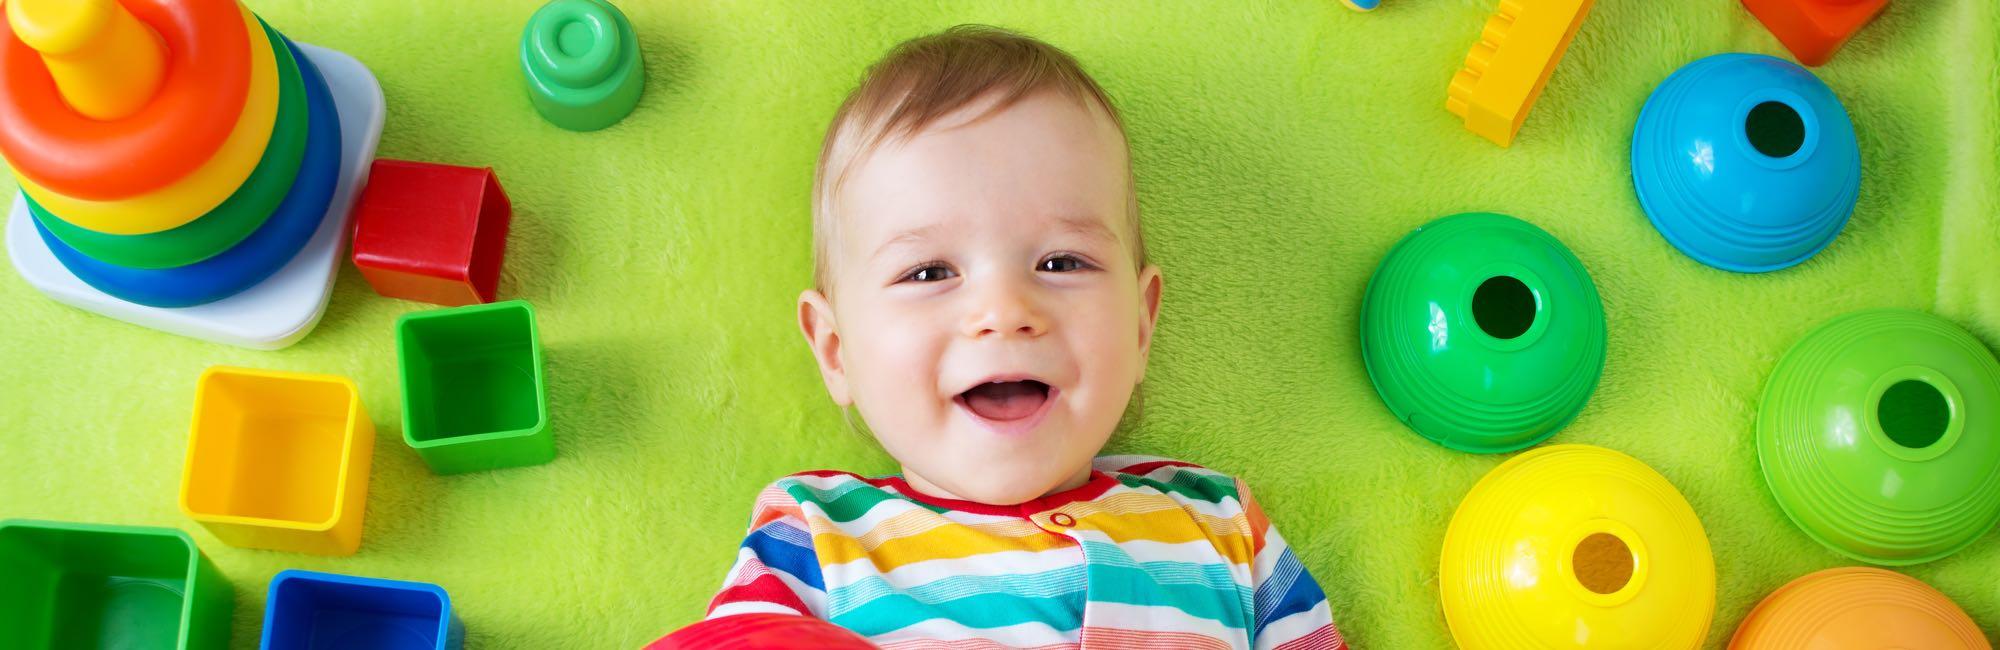 desenvolvimento-da-crianca-na-escola-a-partir-de-1-ano-de-idade-1